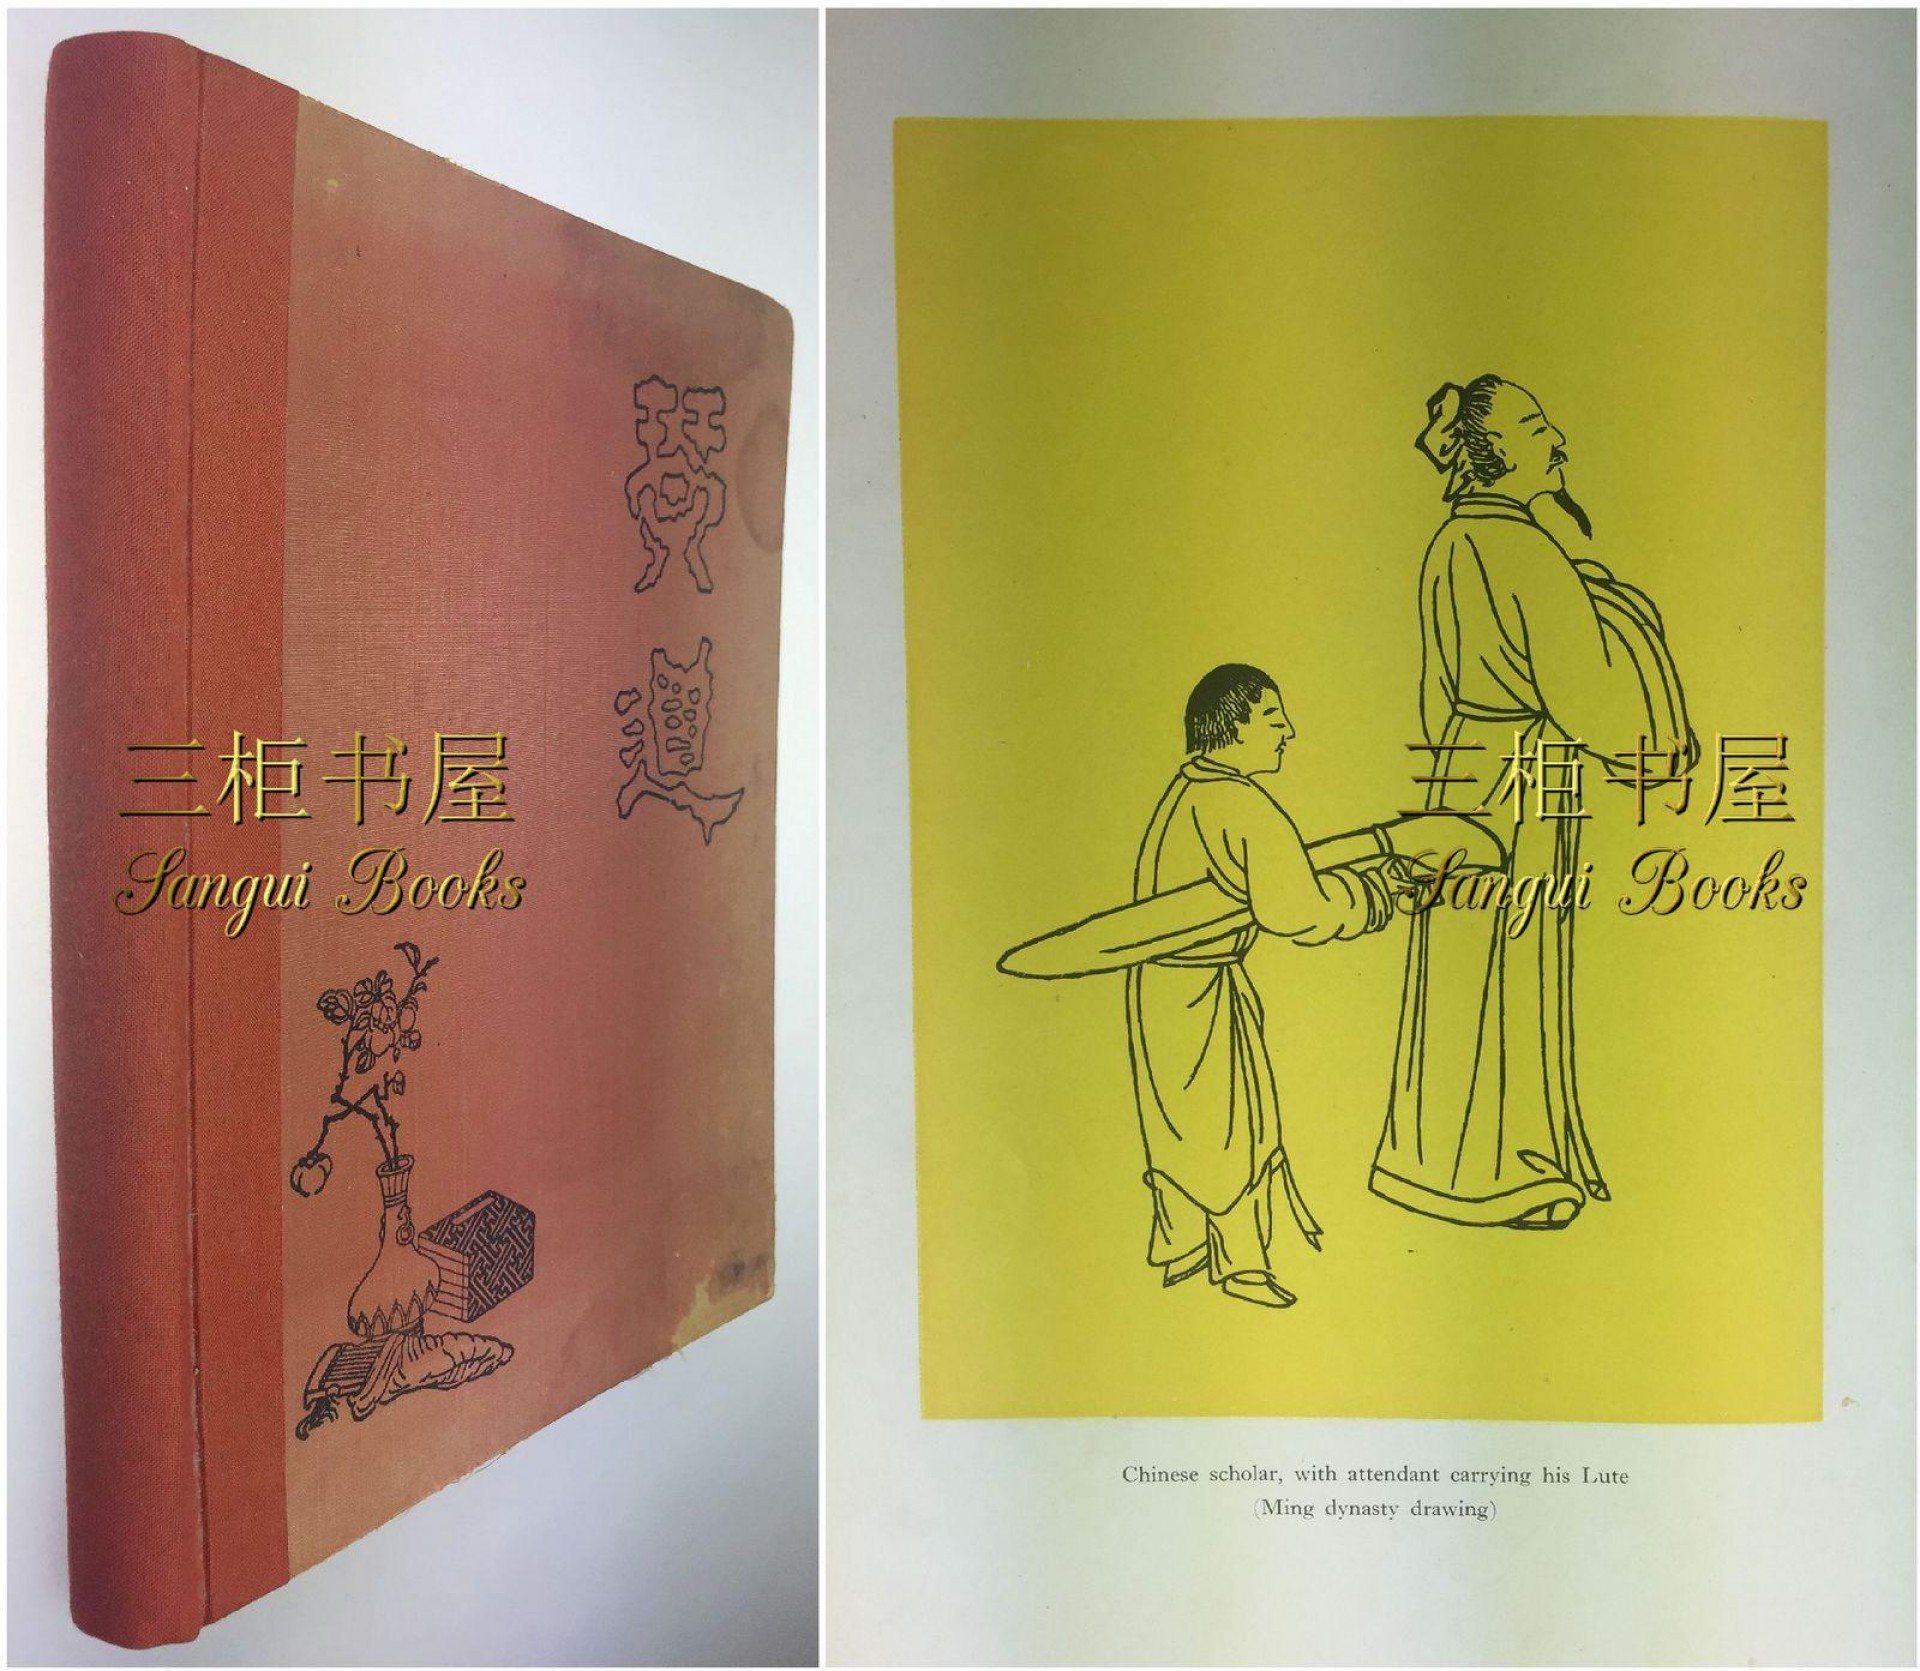 008 Essay Example Amazing Chinese Art Topics Vce Formats Sheet 1920